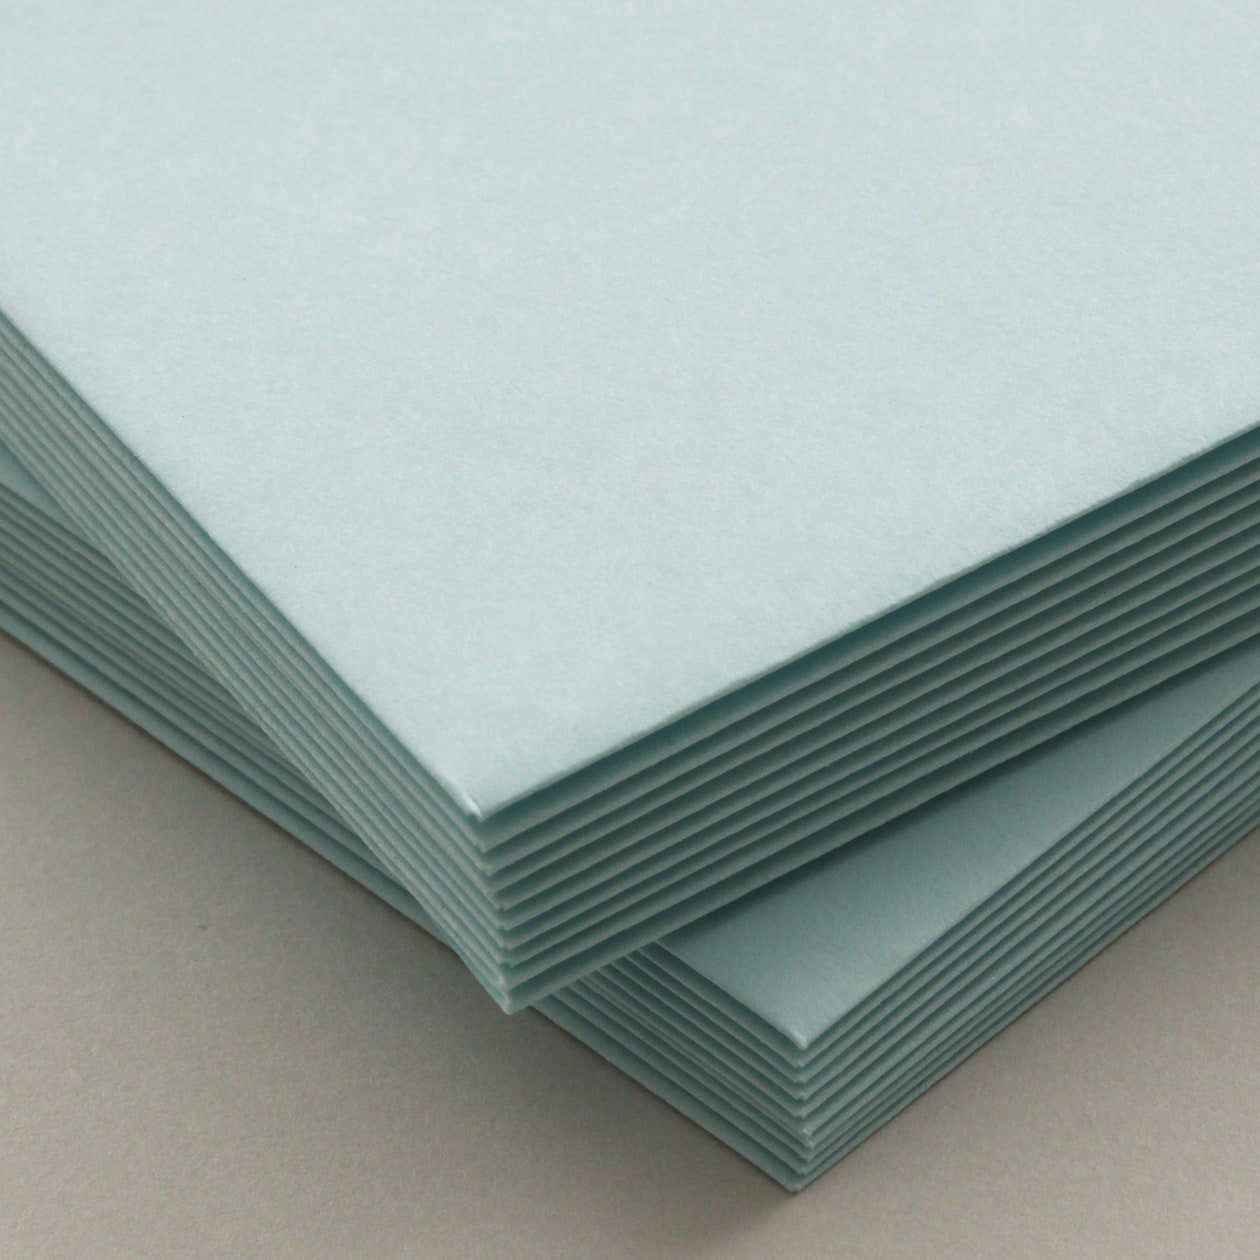 NEカマス封筒 上質カラー ブルー 90.7g